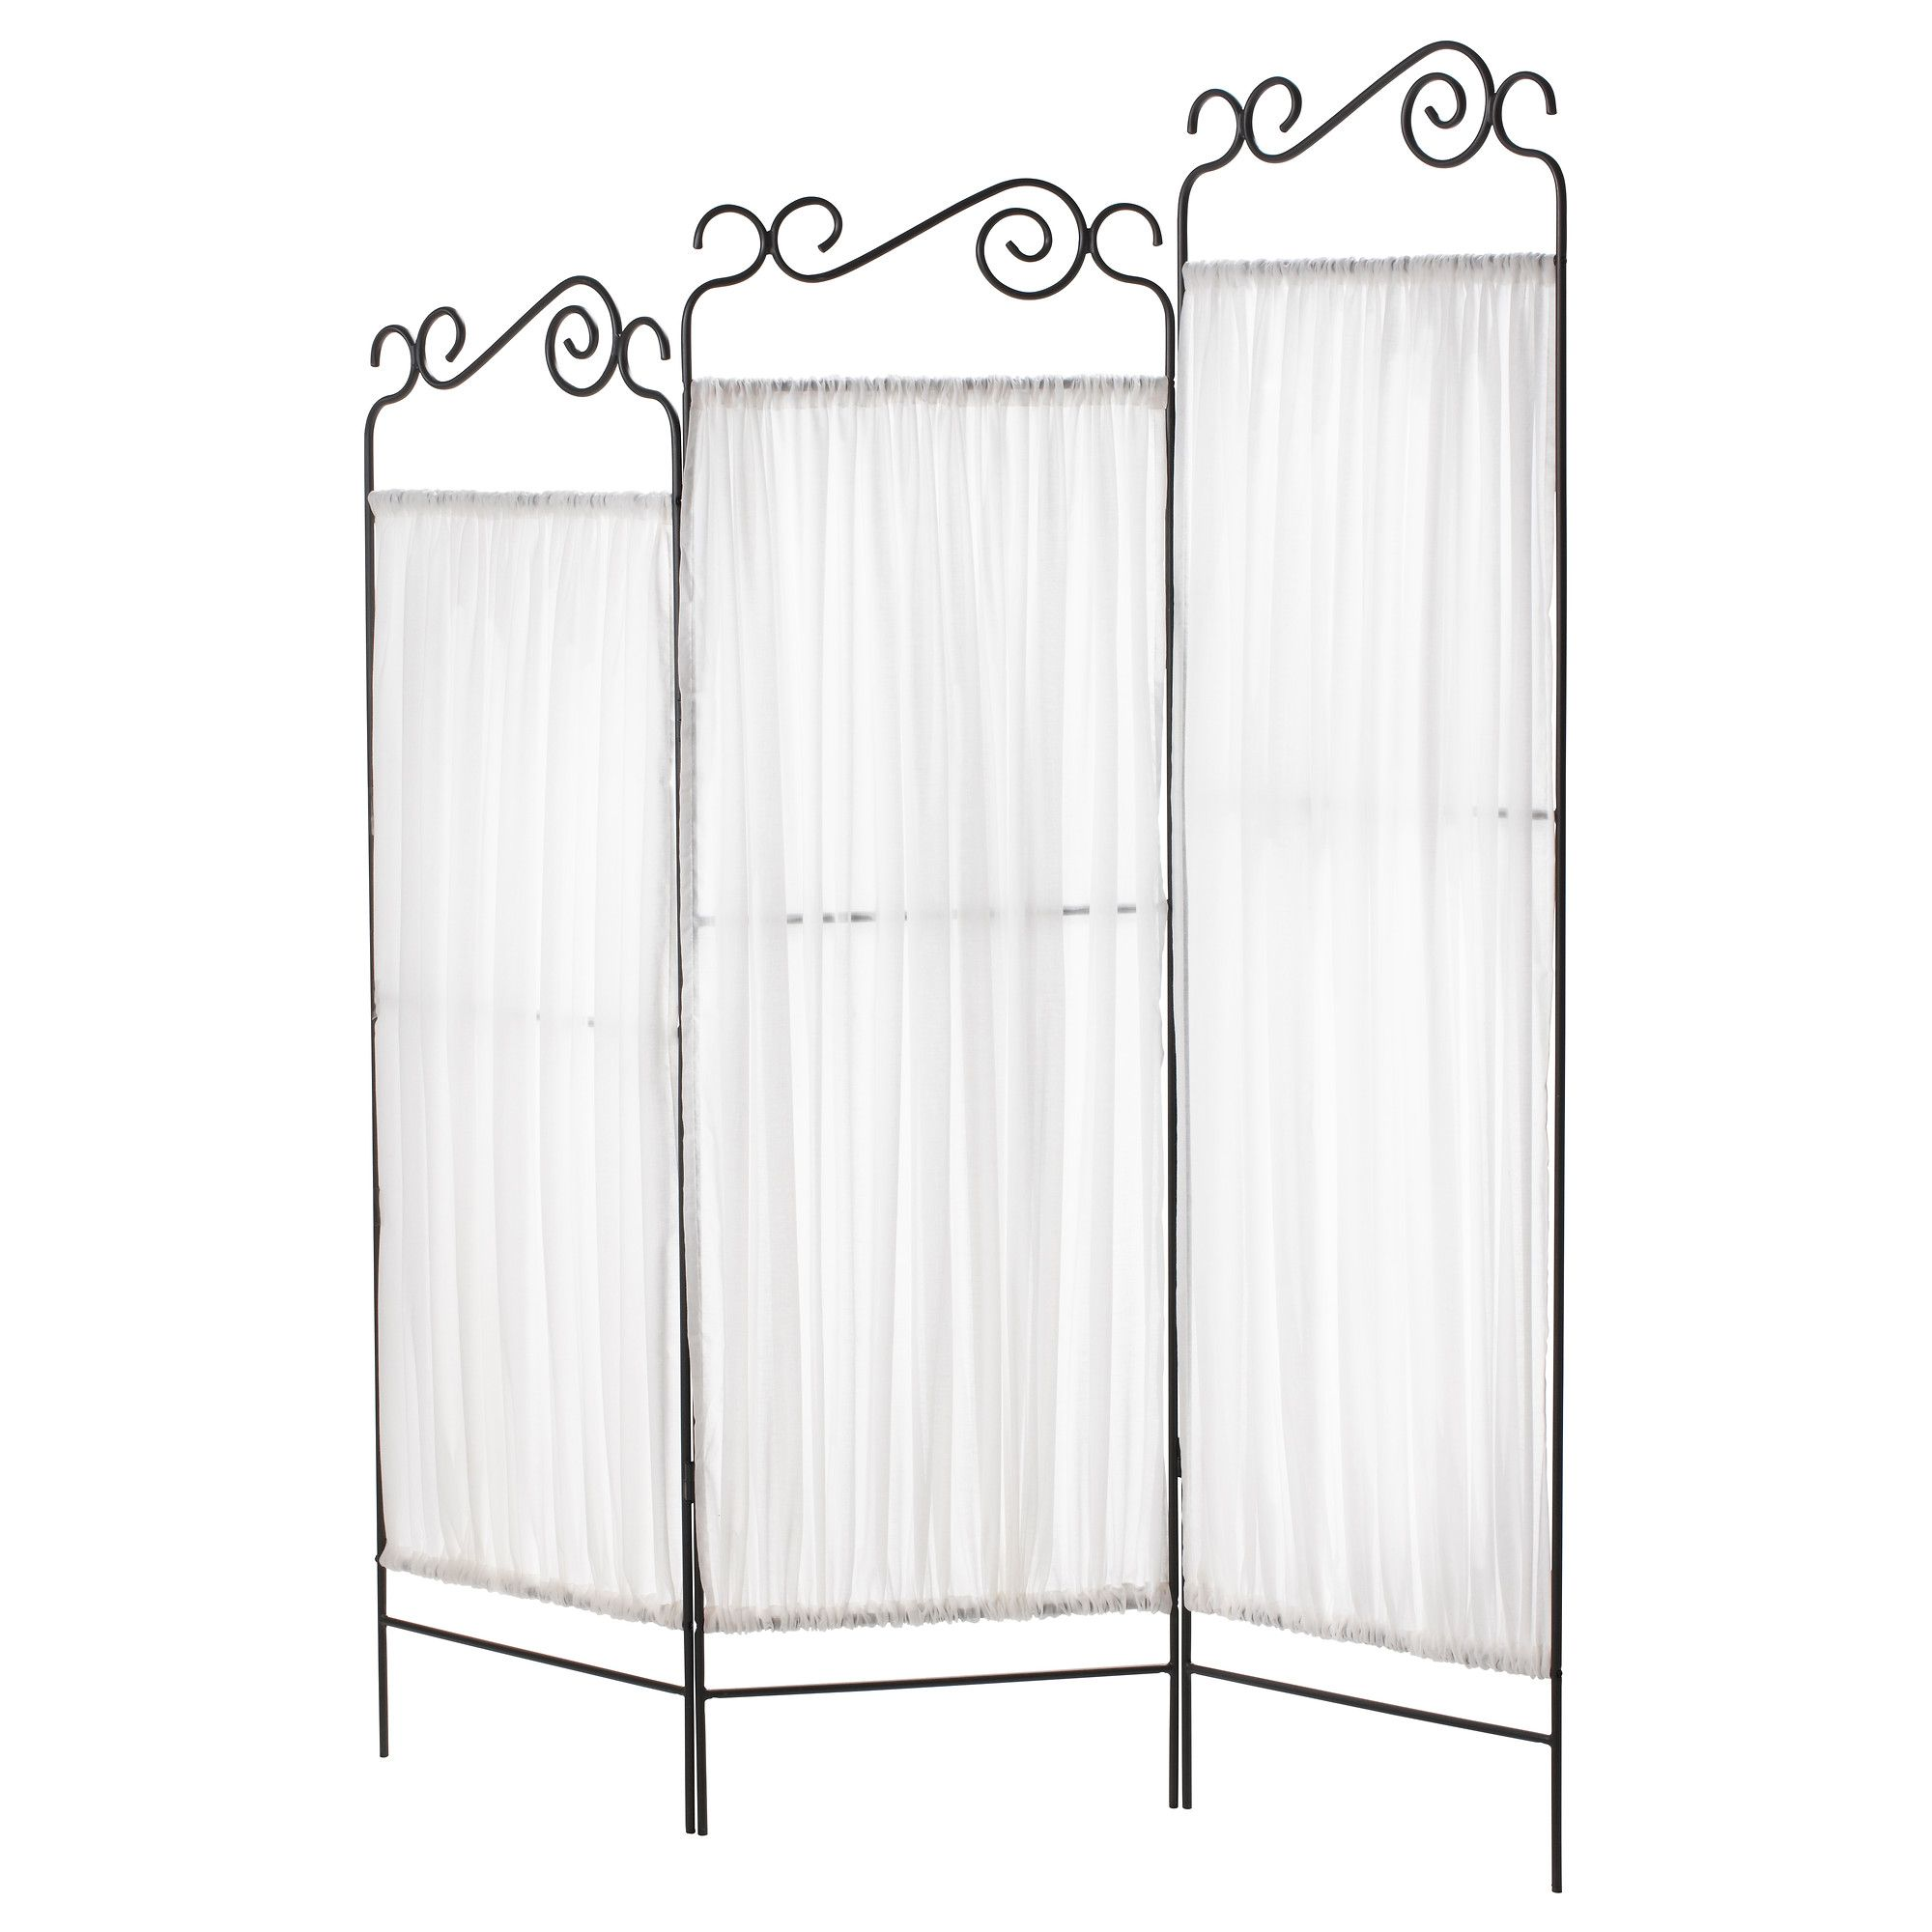 01e30dfa6f042b9d2158bfa32eea08ce Incroyable De Table Balcon Suspendue Ikea Concept